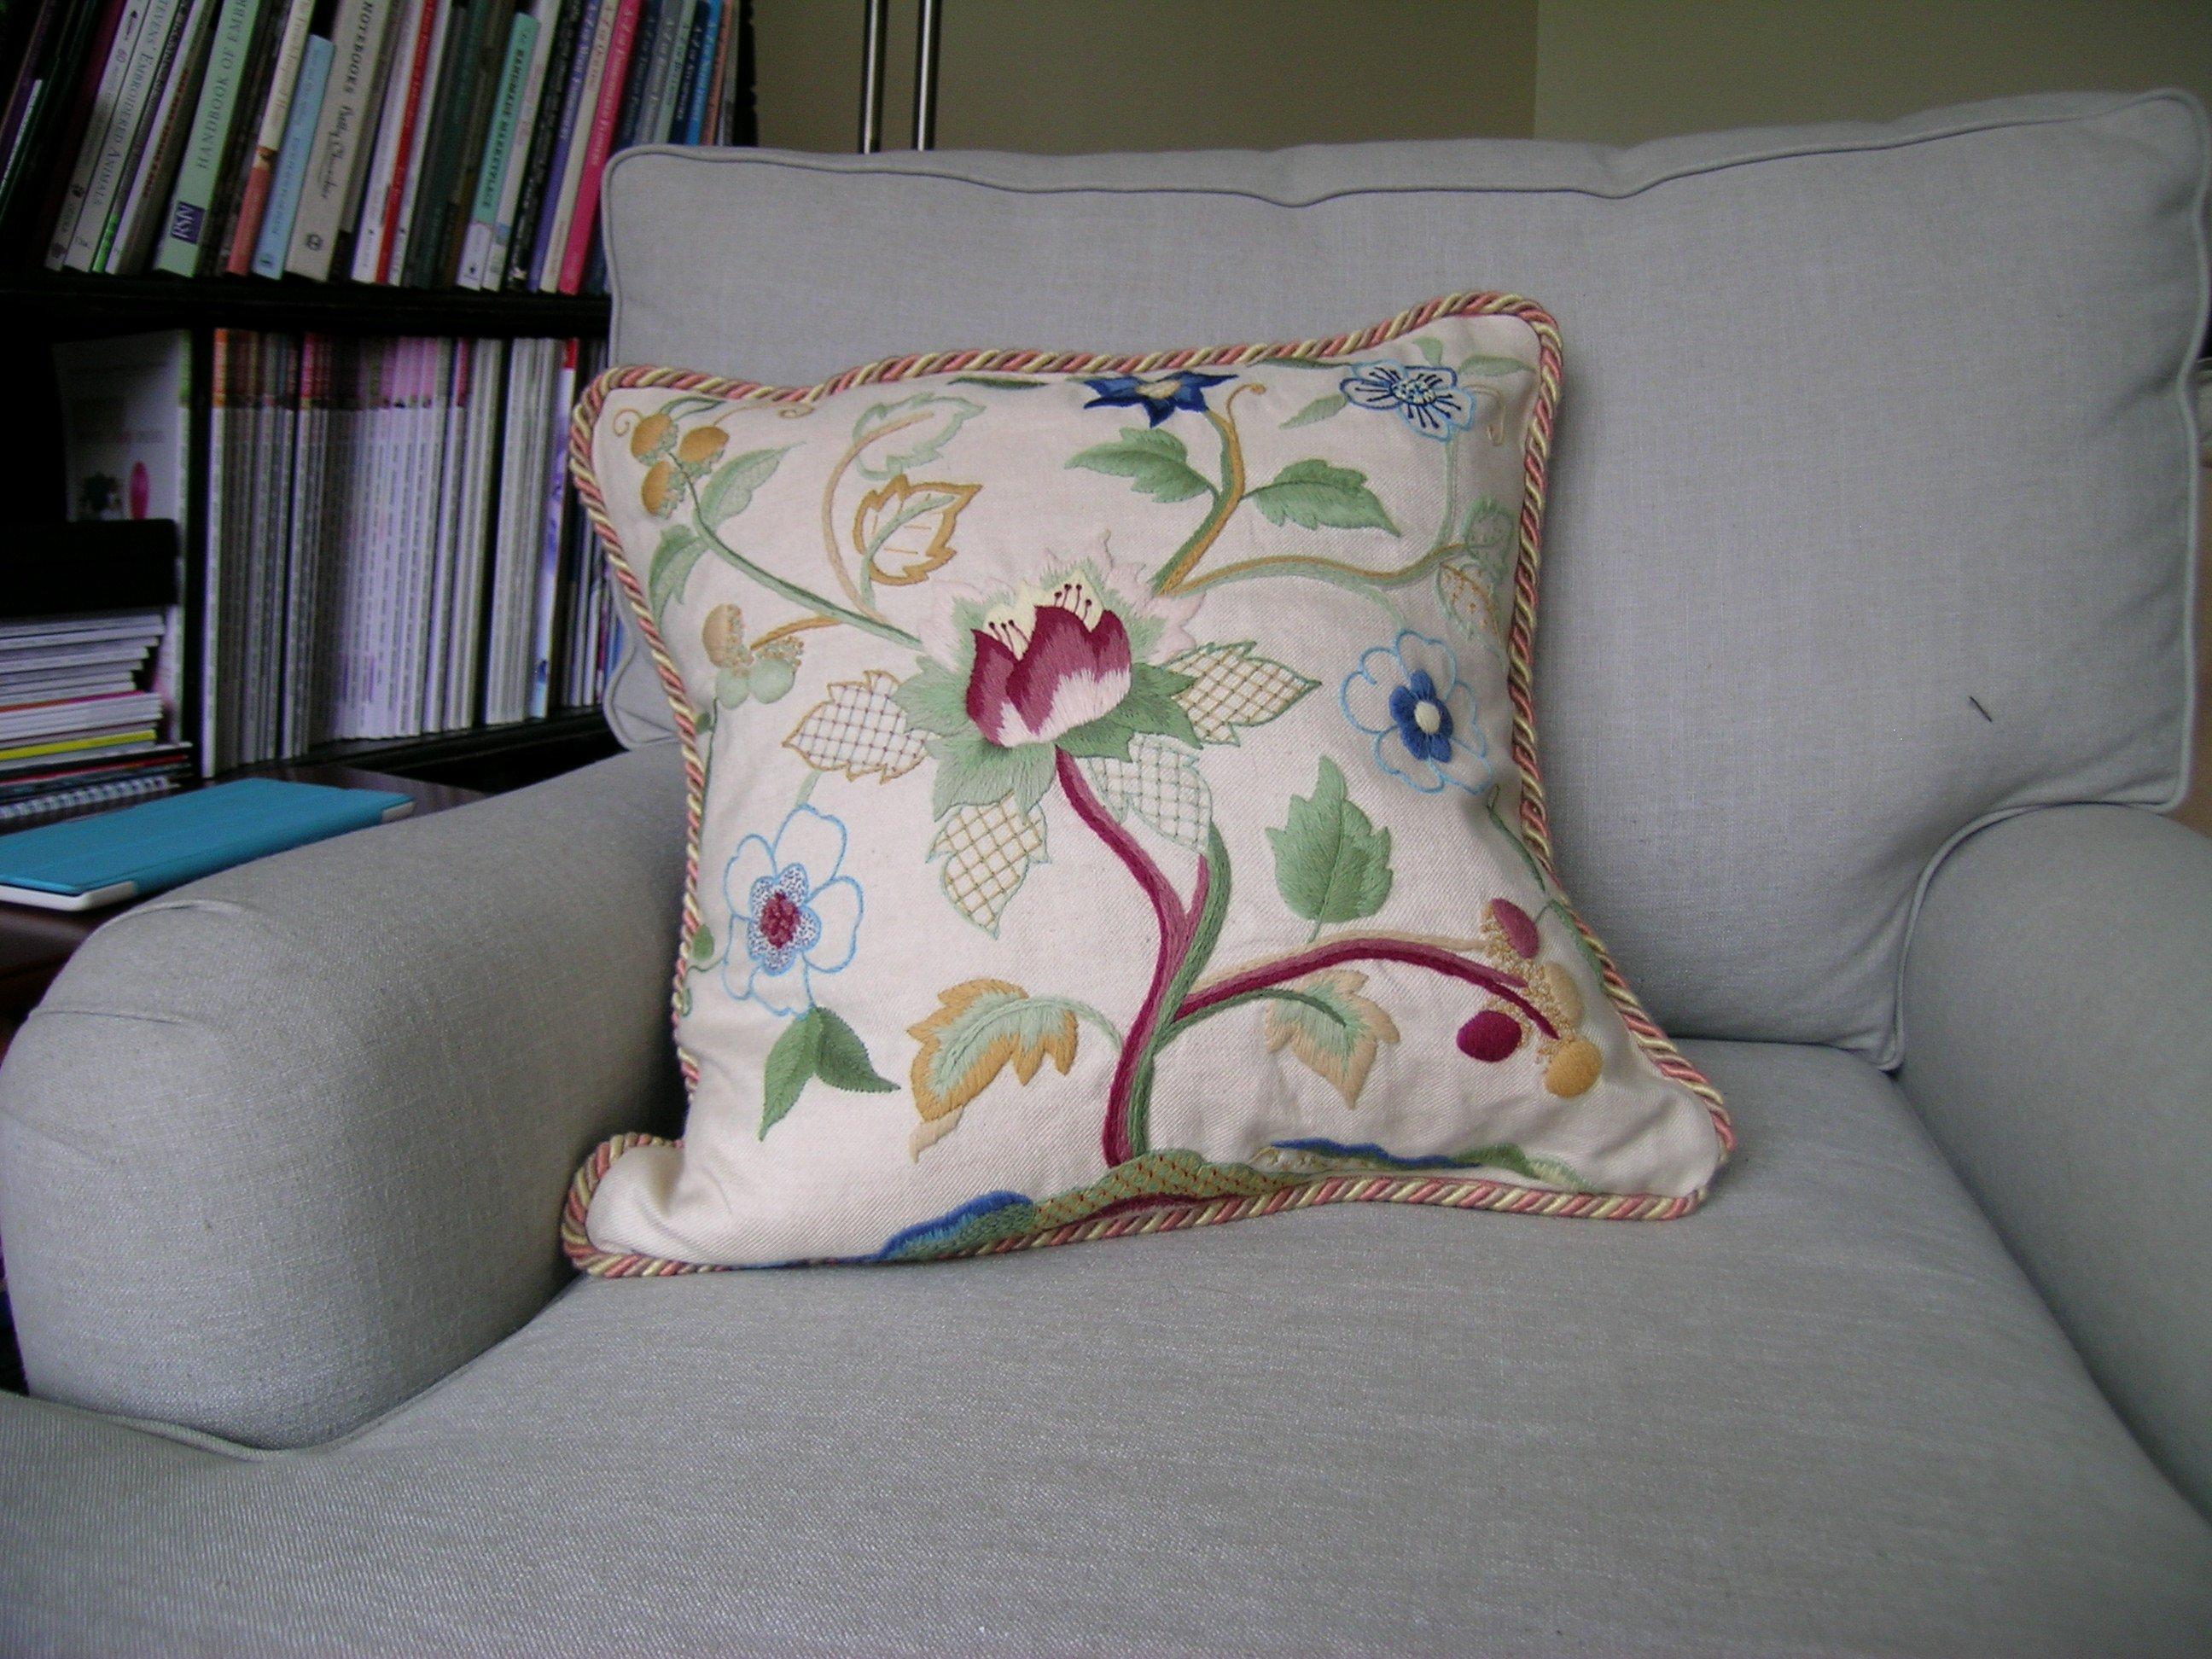 The new Tulip tree Cushion - designed by Phillipa Turnbull